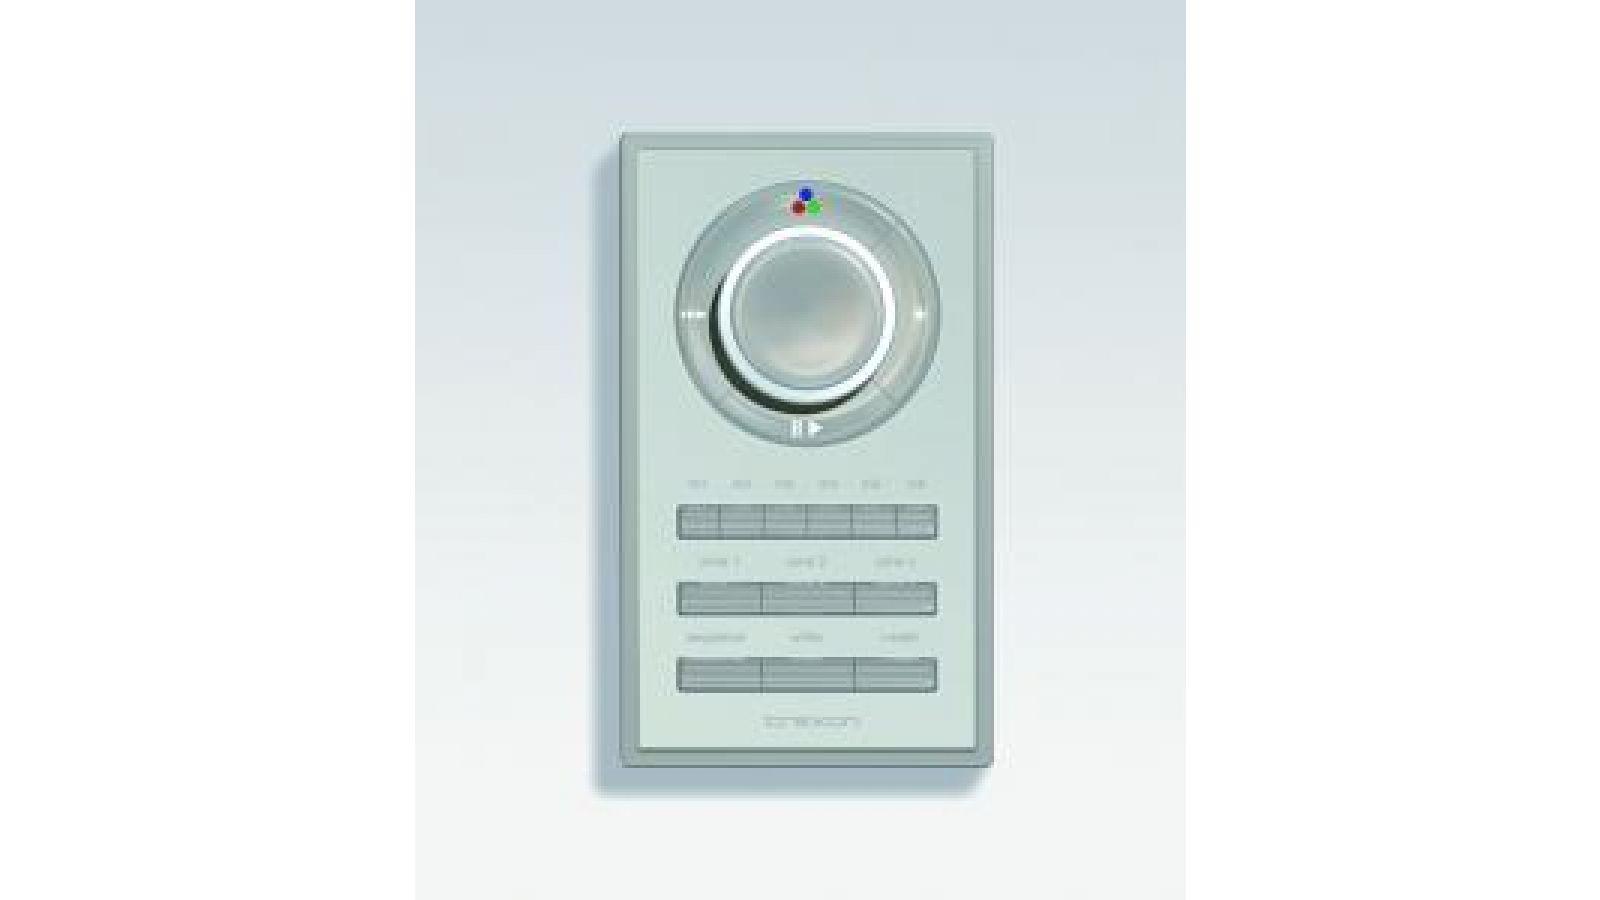 Light-Drive DMX Controls